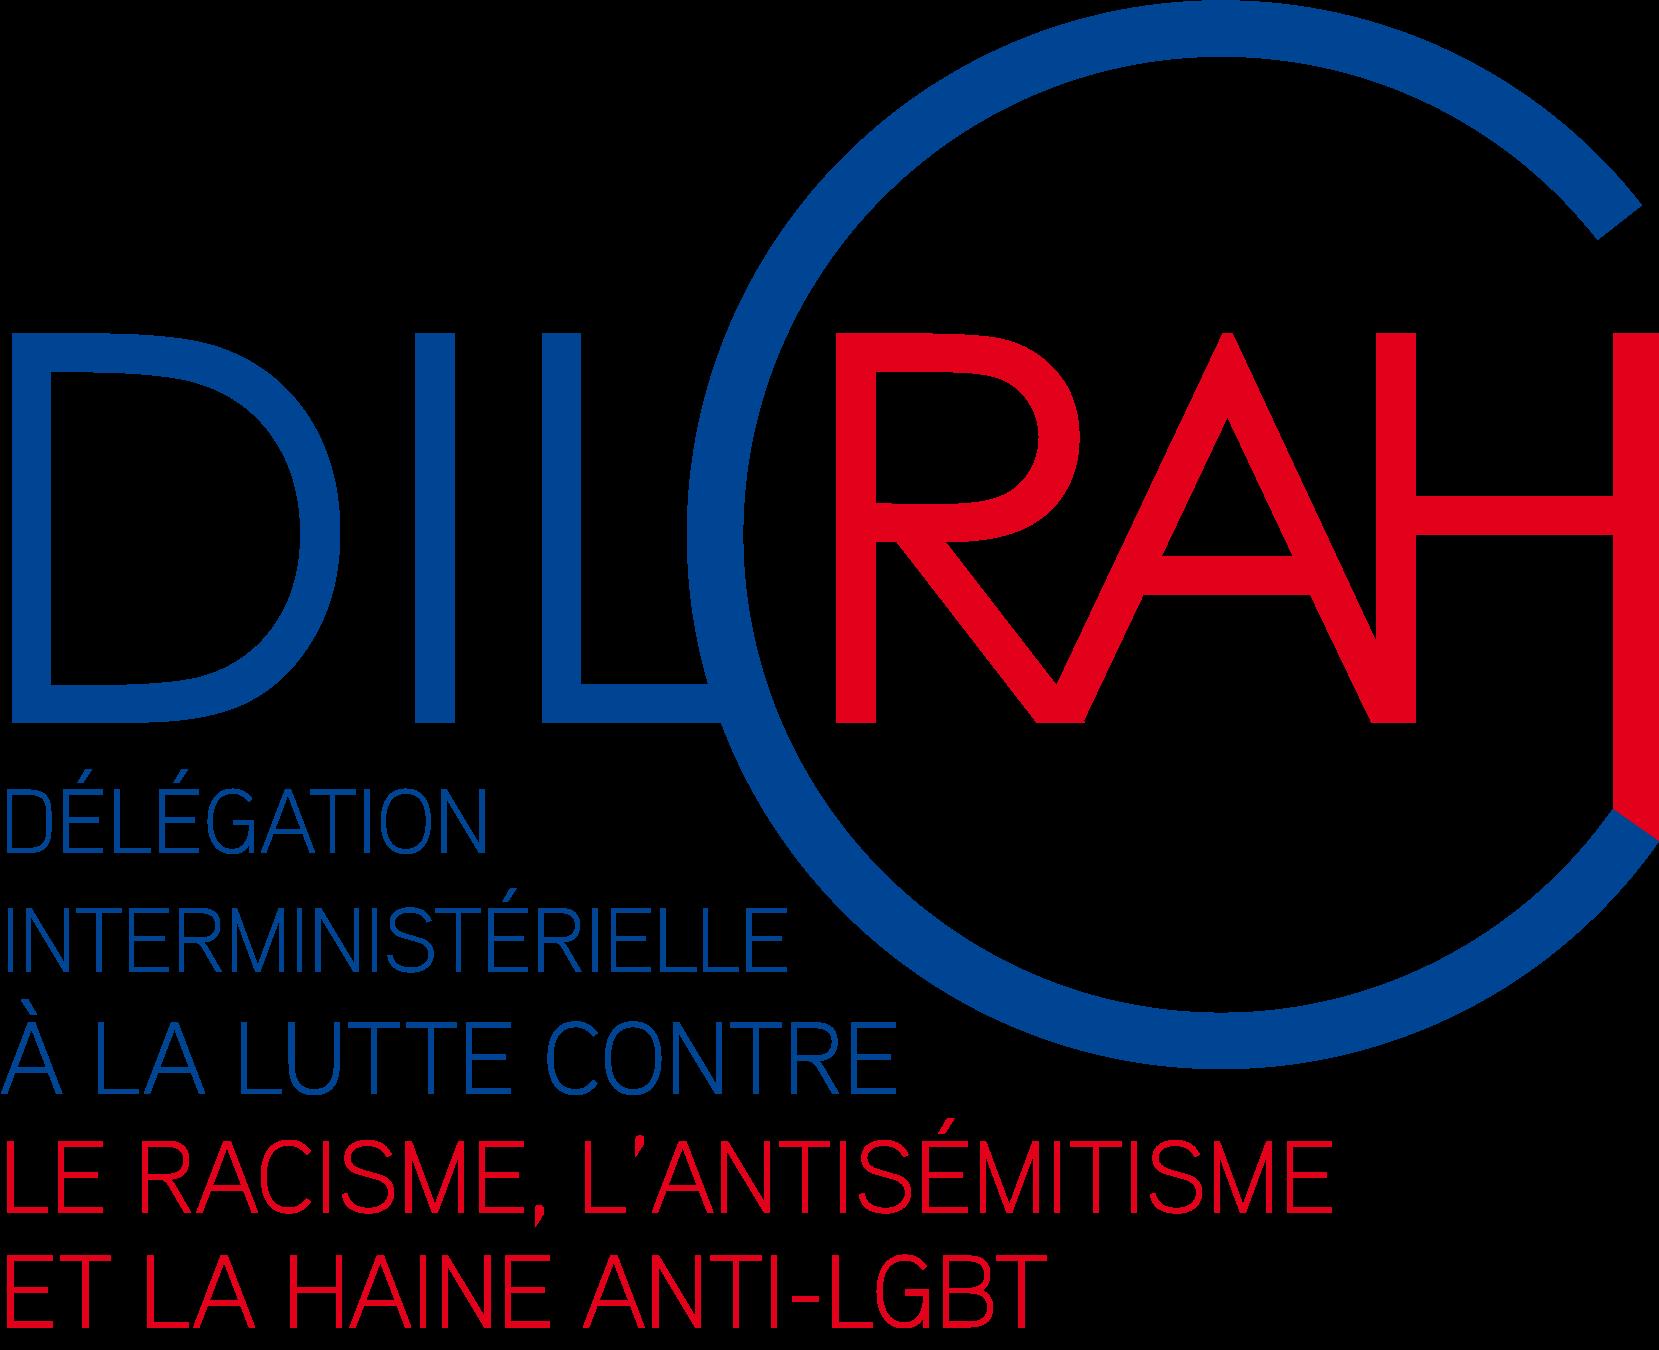 logo-DILCRA-typo-2017 (1)